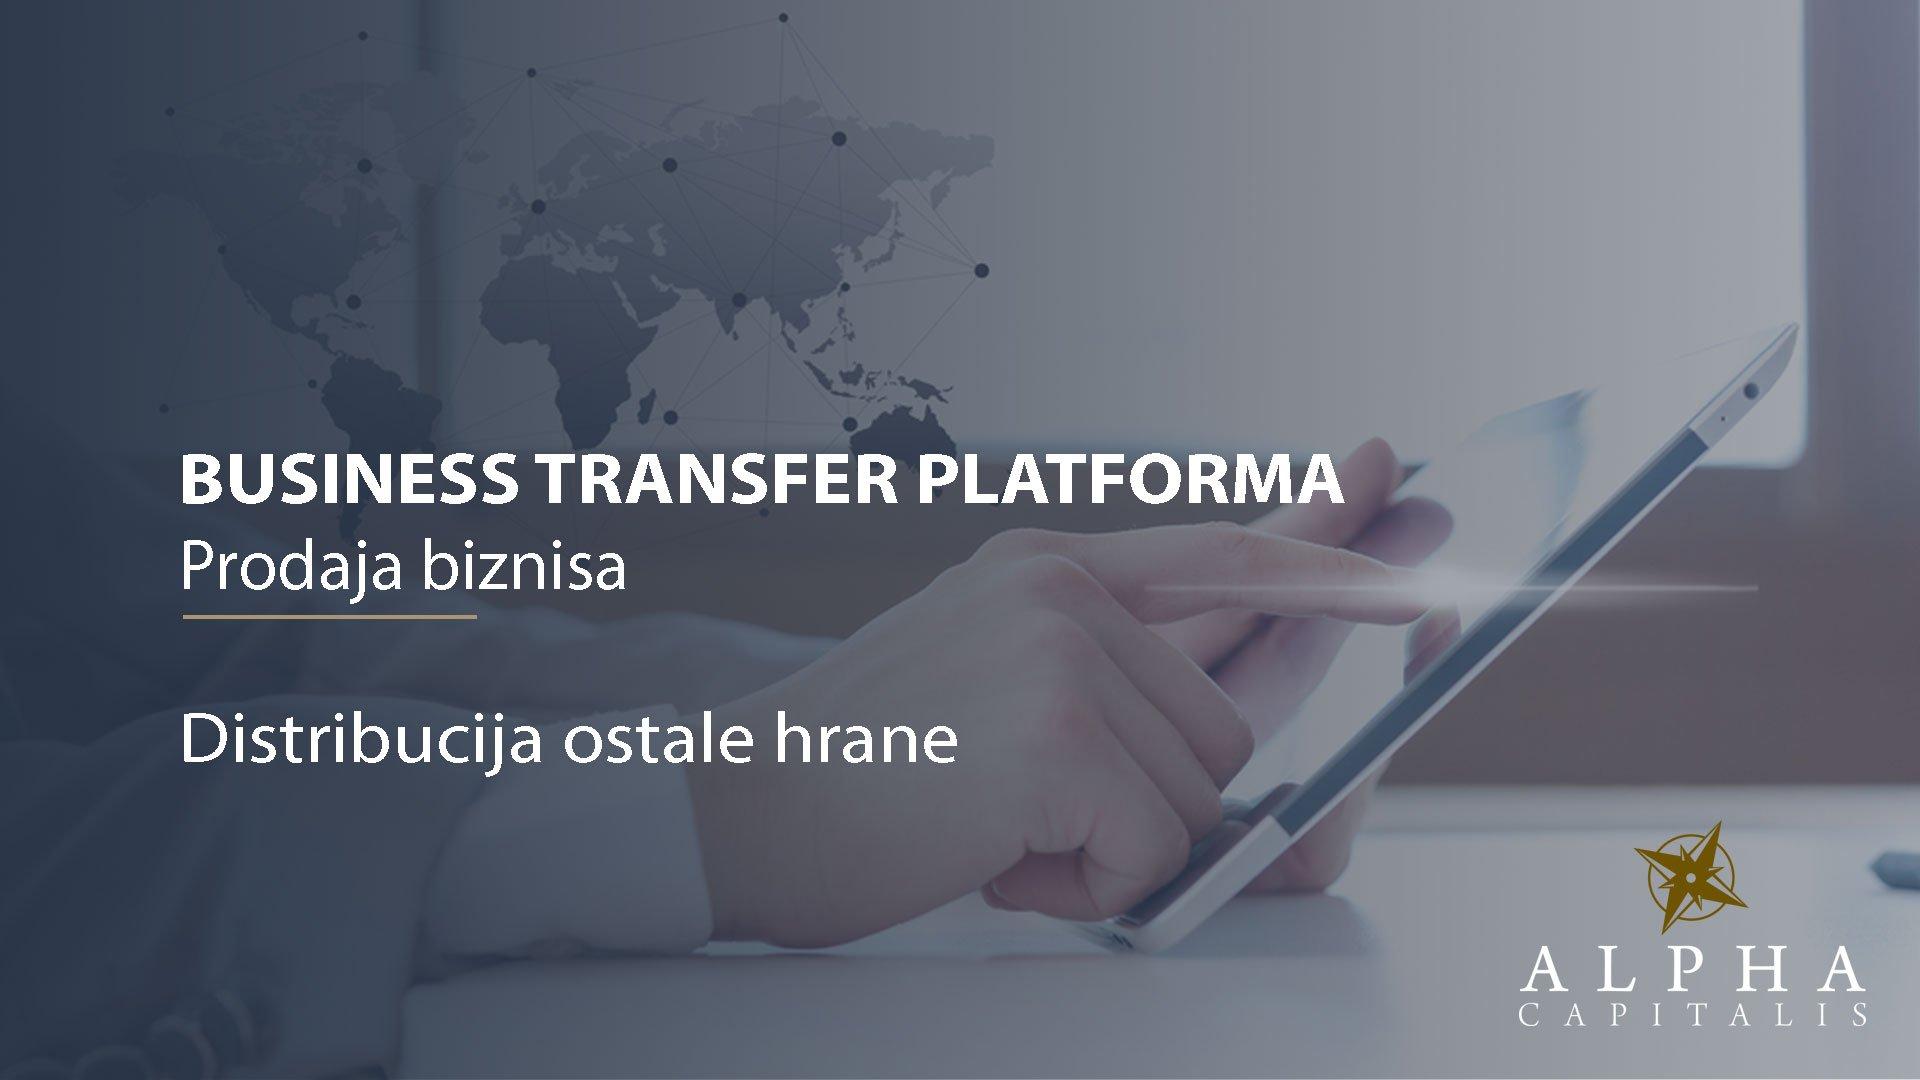 Business-transfer-platforma-distribucija-ostale-hrane